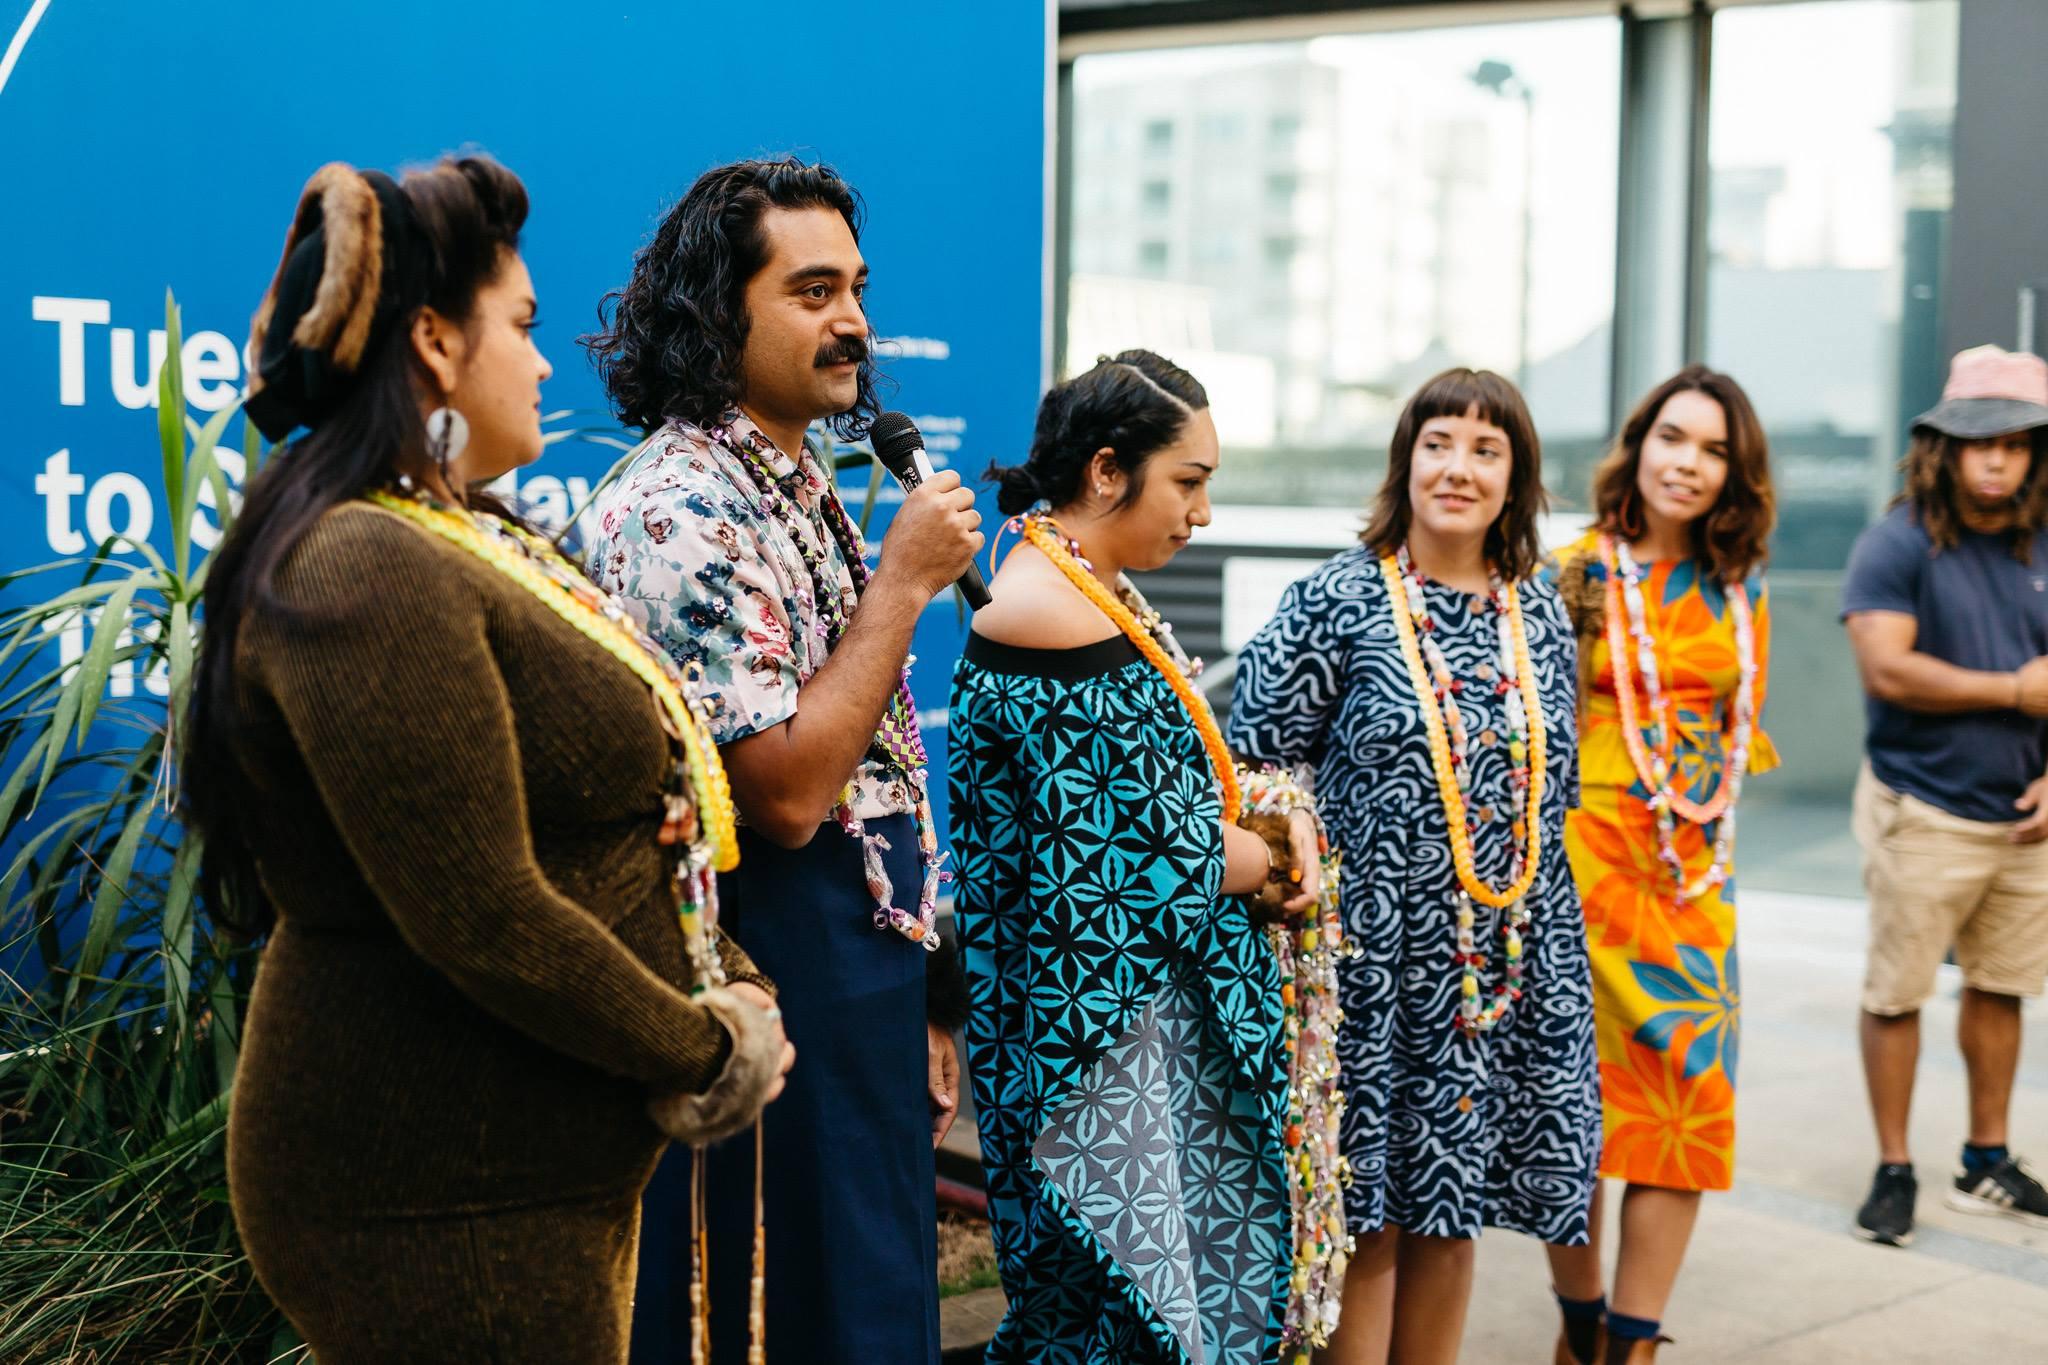 The Commute curators: Sarah Biscarra Dilley, Léuli Eshraghi, Lana Lopesi, Tarah Hogue and Freja Carmichael. Photography by Markus Ravik.